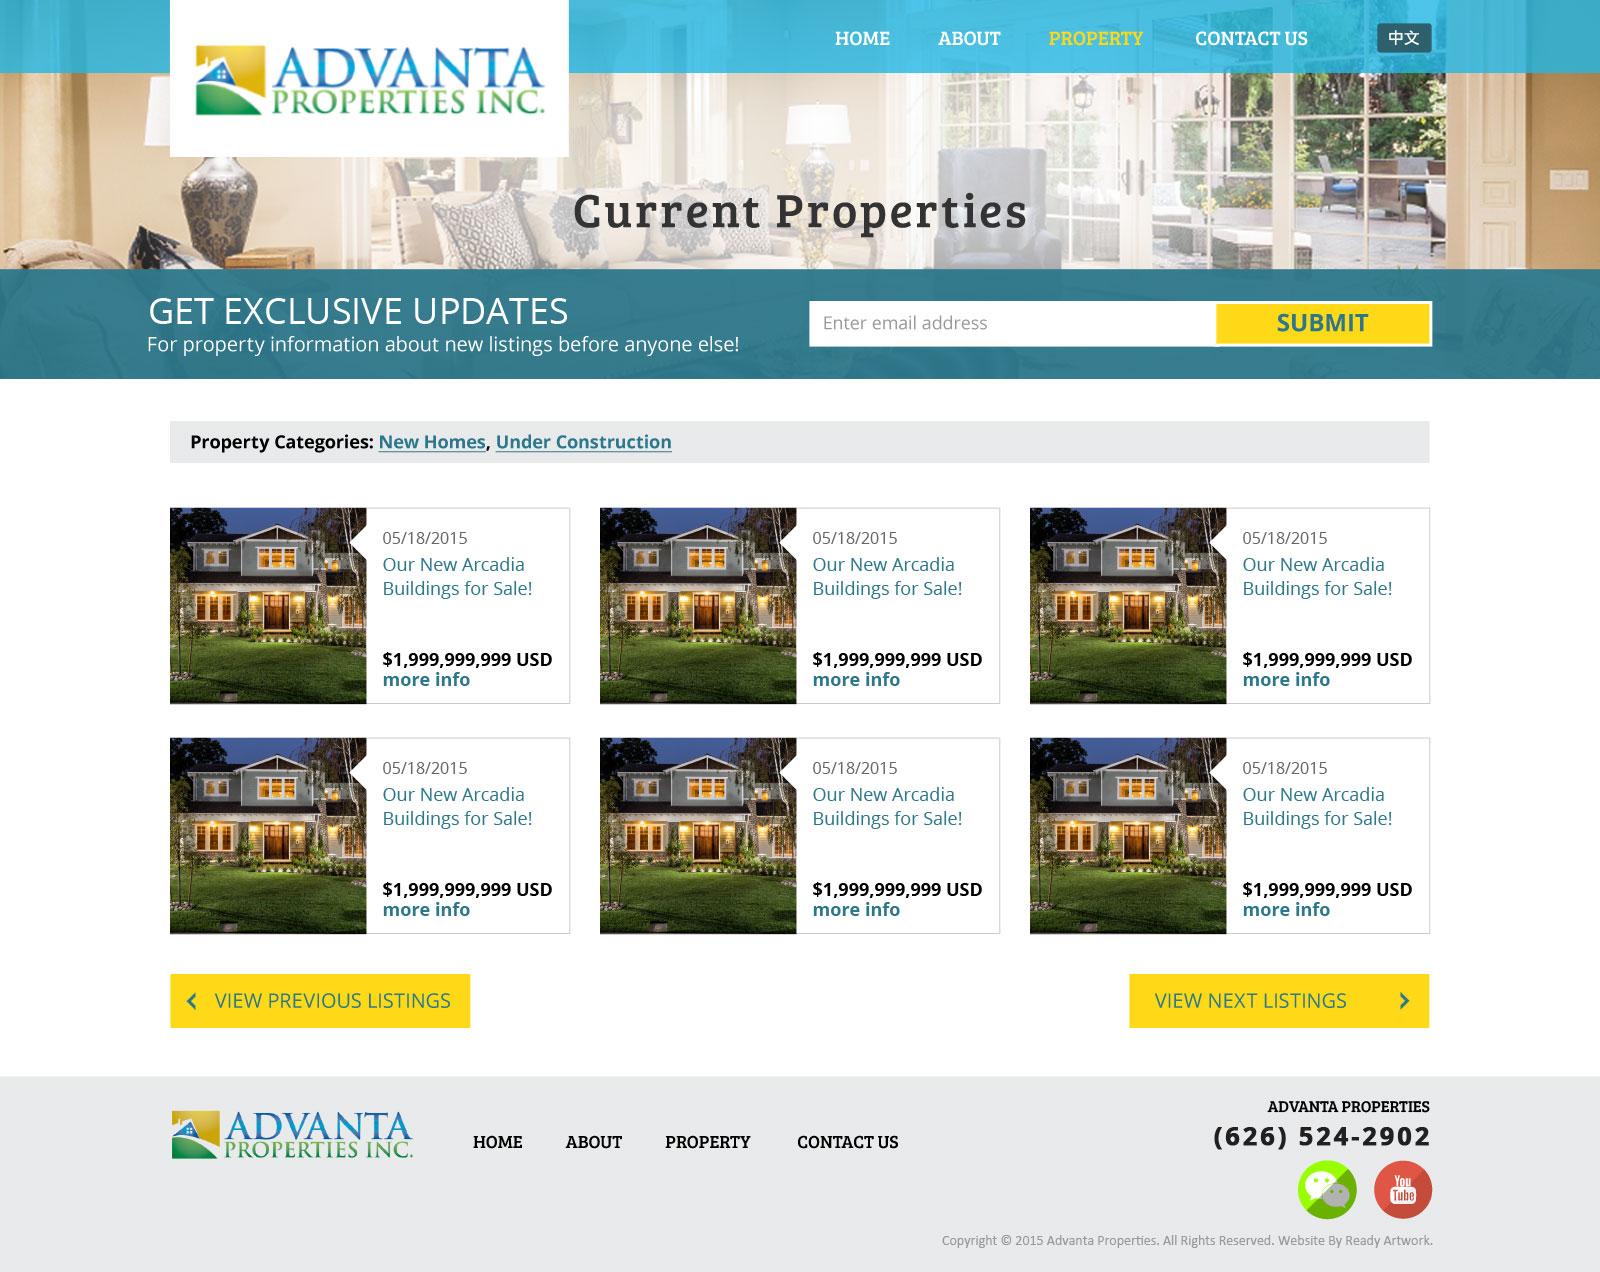 Advanta Web Design